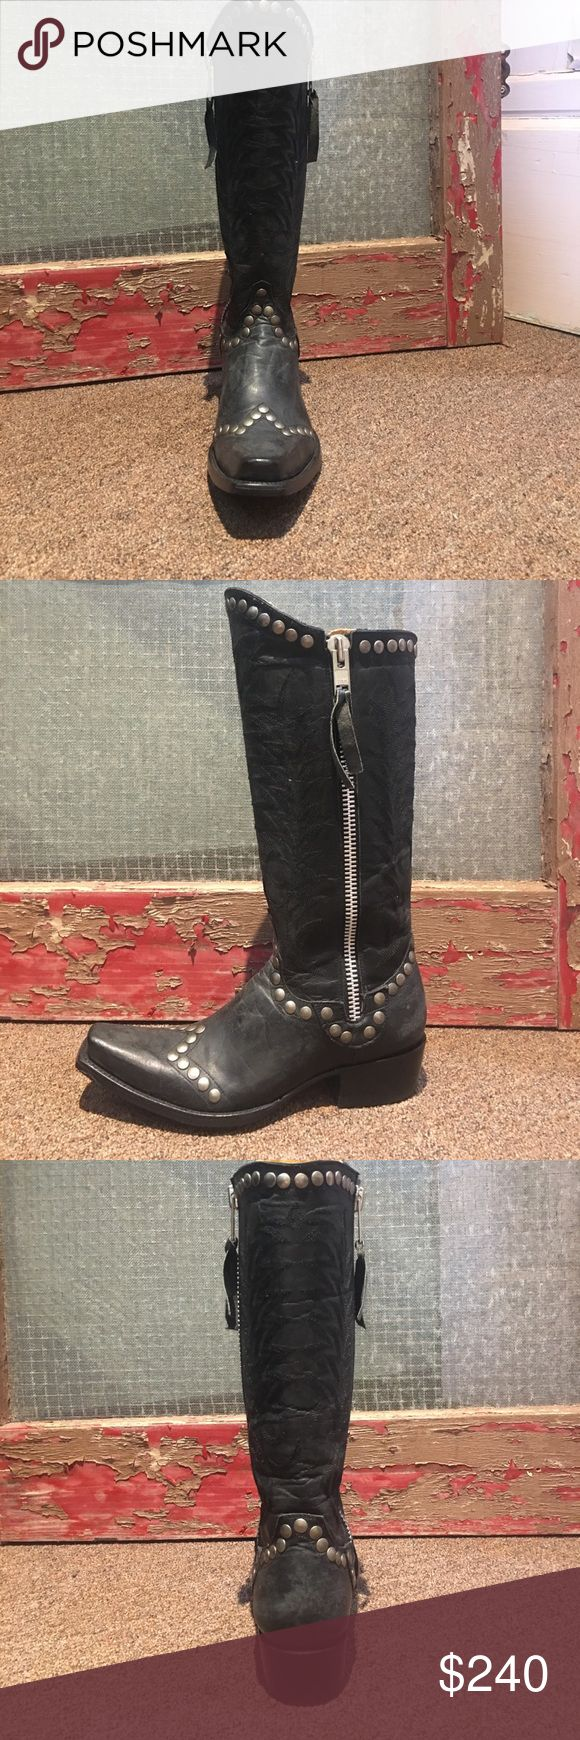 Size 7 Old Gringo RockRazz boot FABULOUS STUDDED OLD GRINGO BOOT Old Gringo Shoes